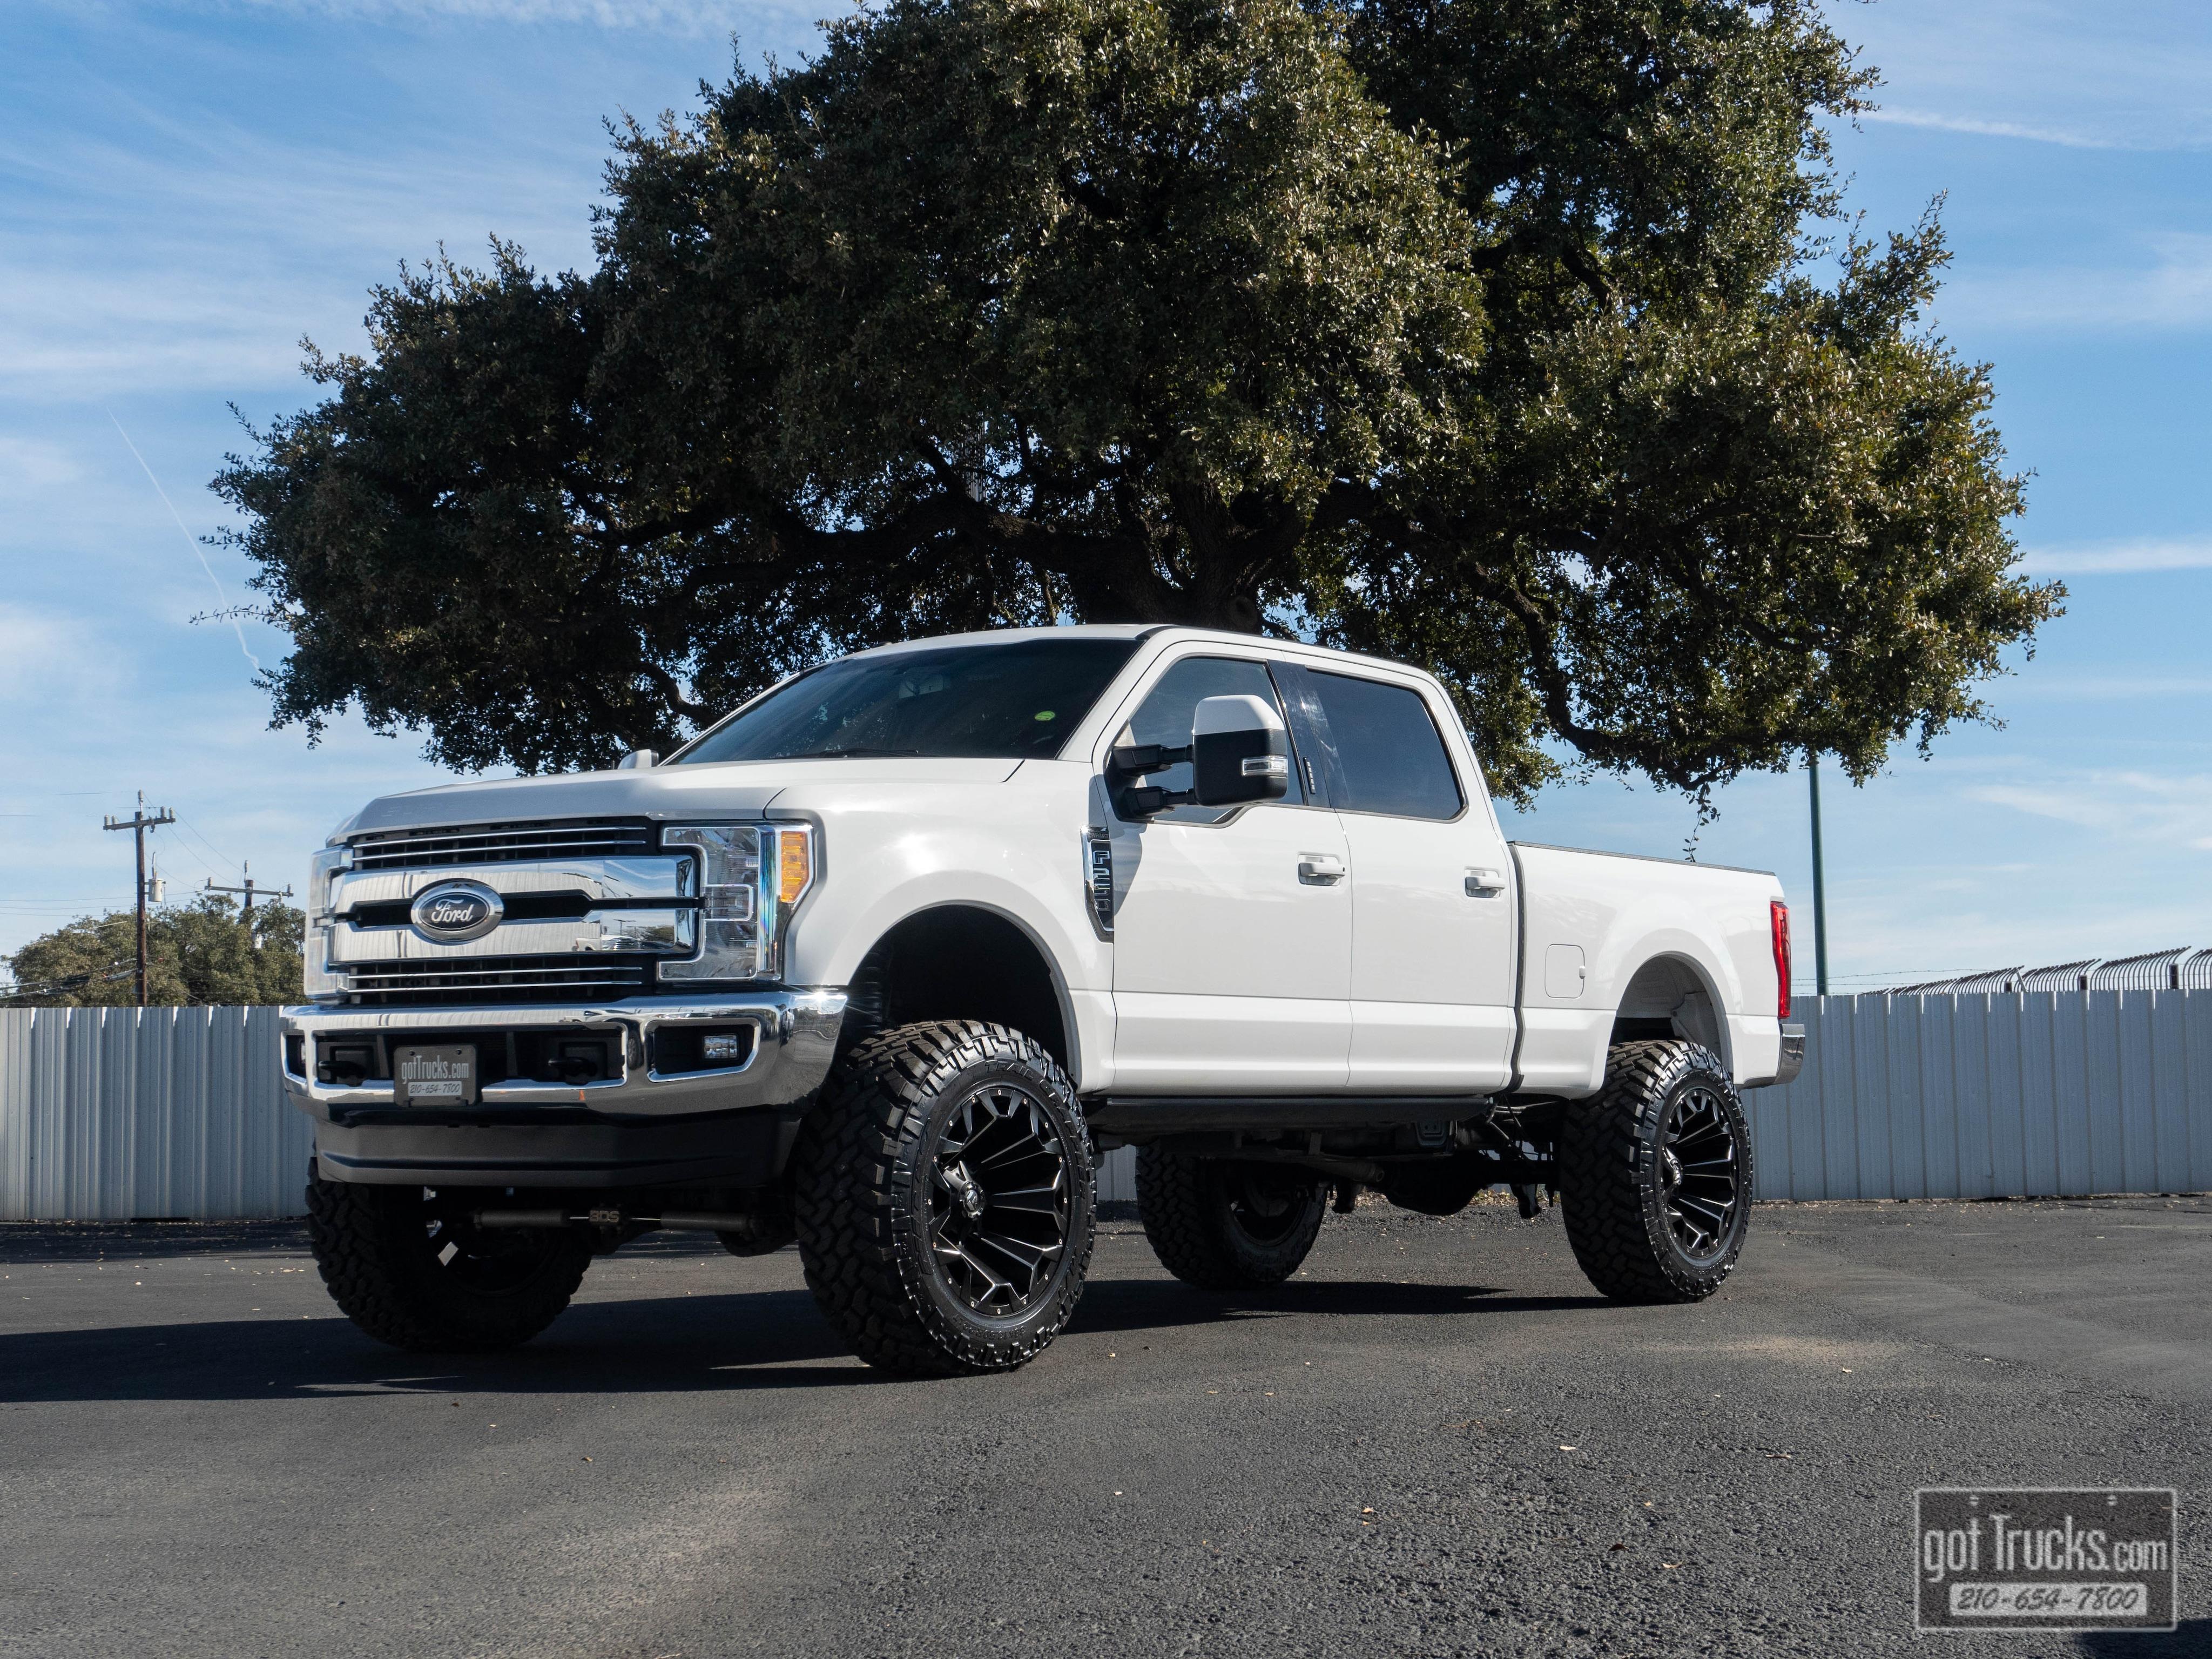 Used Trucks Suvs For Sale In San Antonio American Auto Brokers